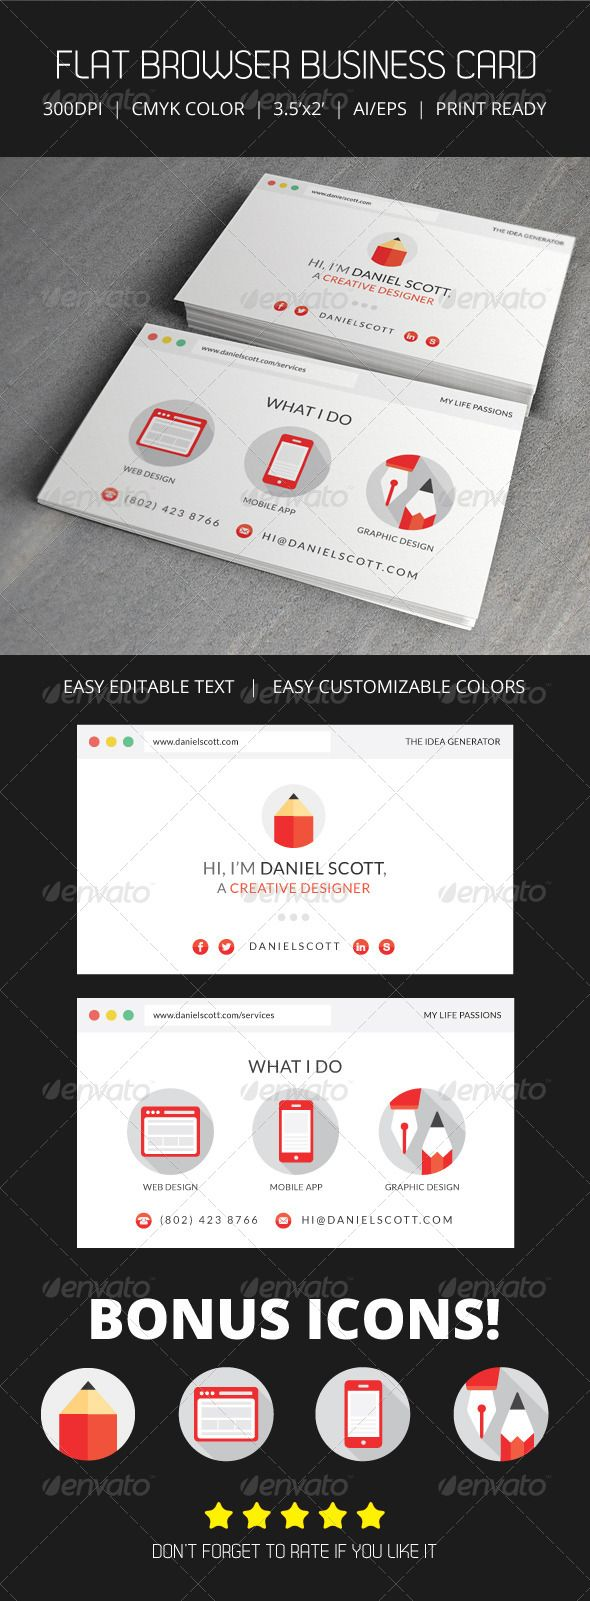 Famous Superhero Business Cards Photos - Business Card Ideas ...